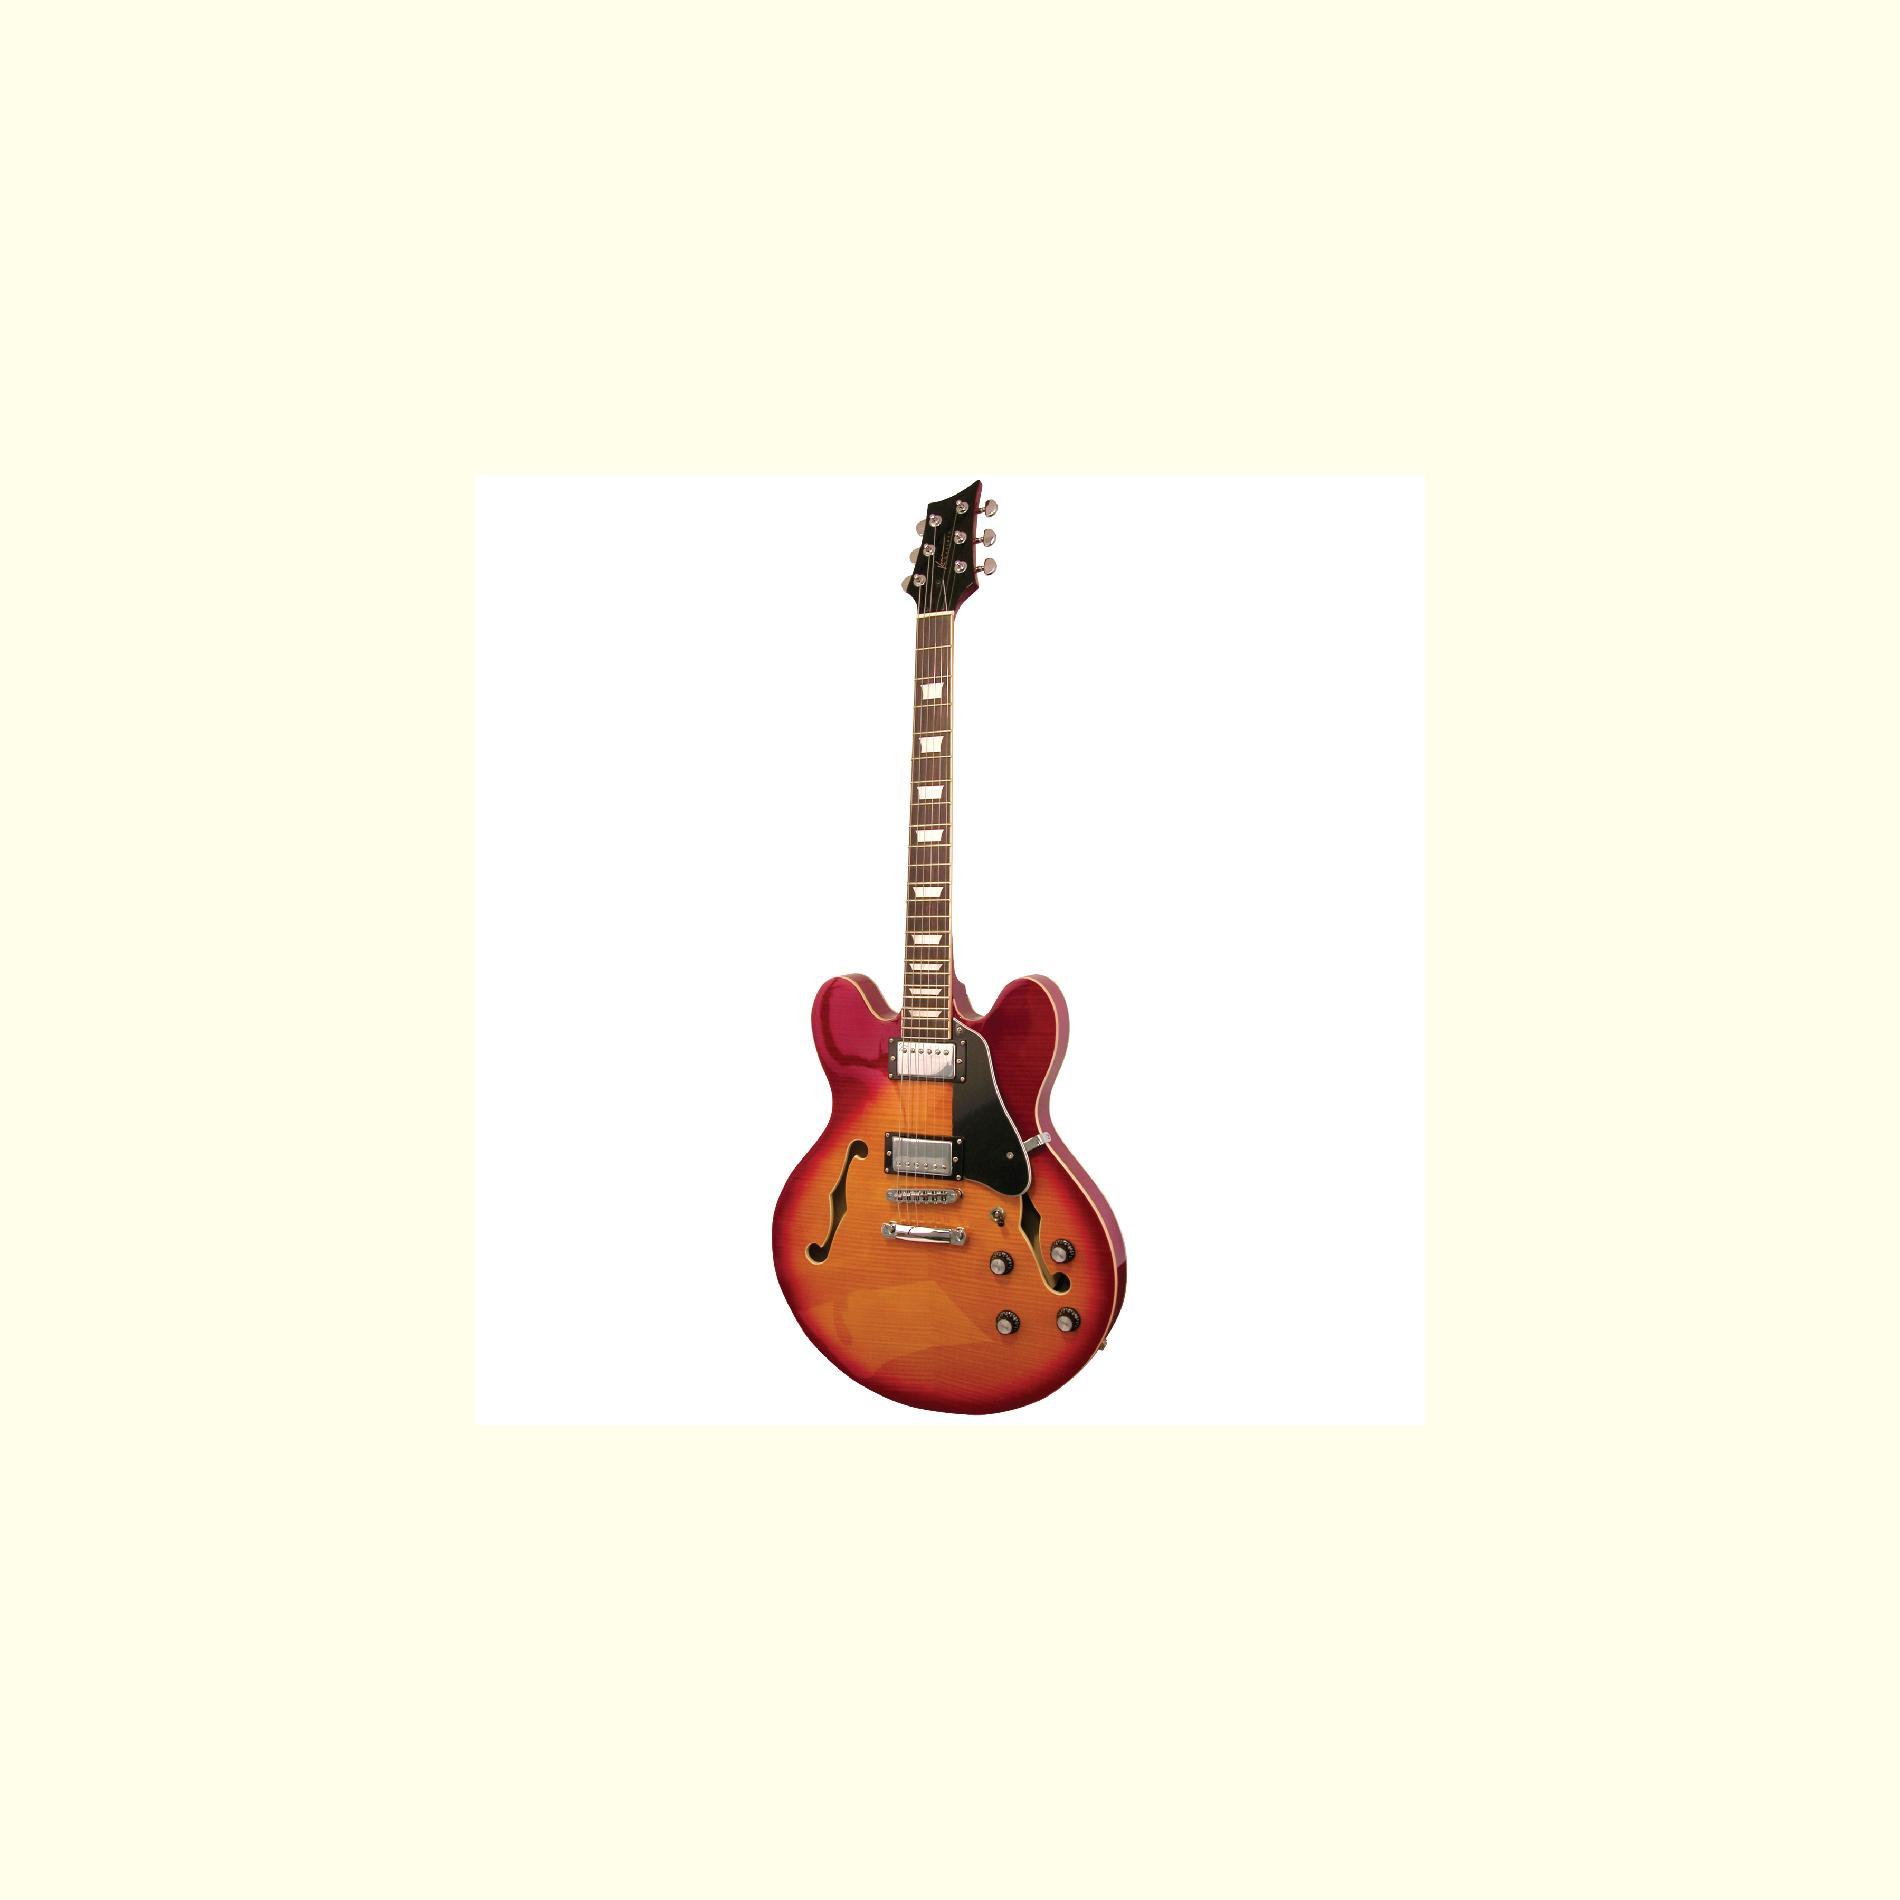 Kona Guitars Kona Flamed Semi Hollow Body Electric Guitar With Custim Fit Case